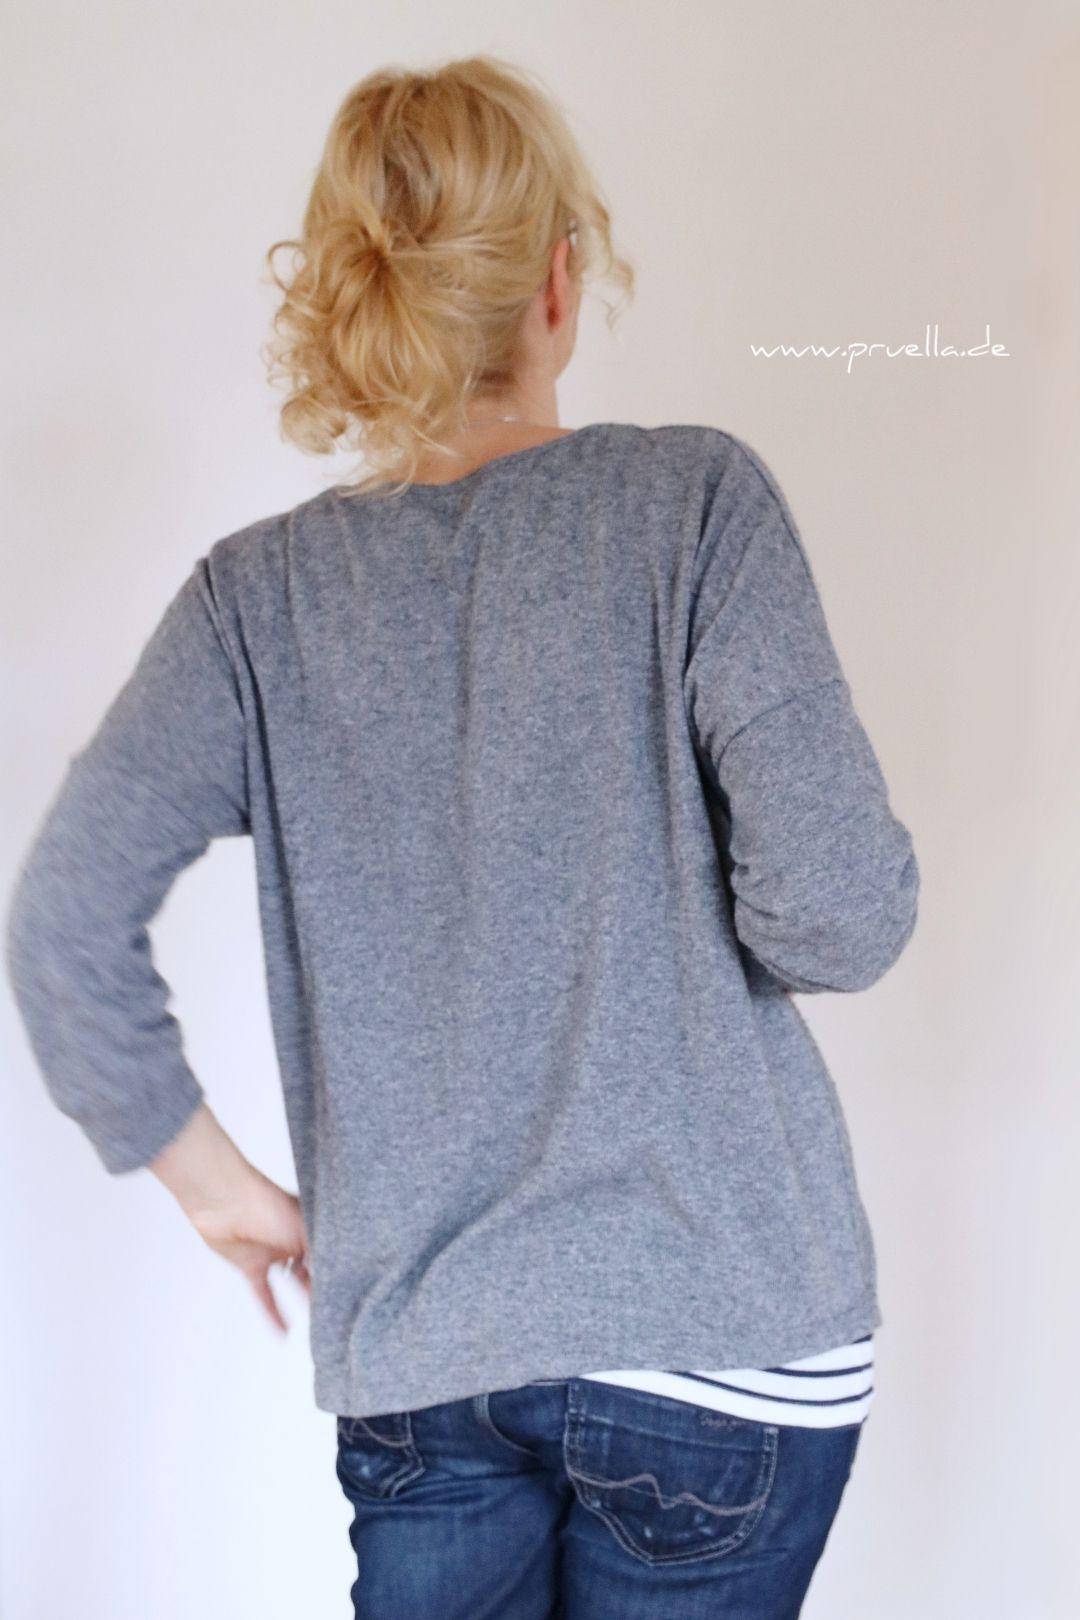 Dauerbrenner FrauAiko in grauem Wollstrick   Pullover ...